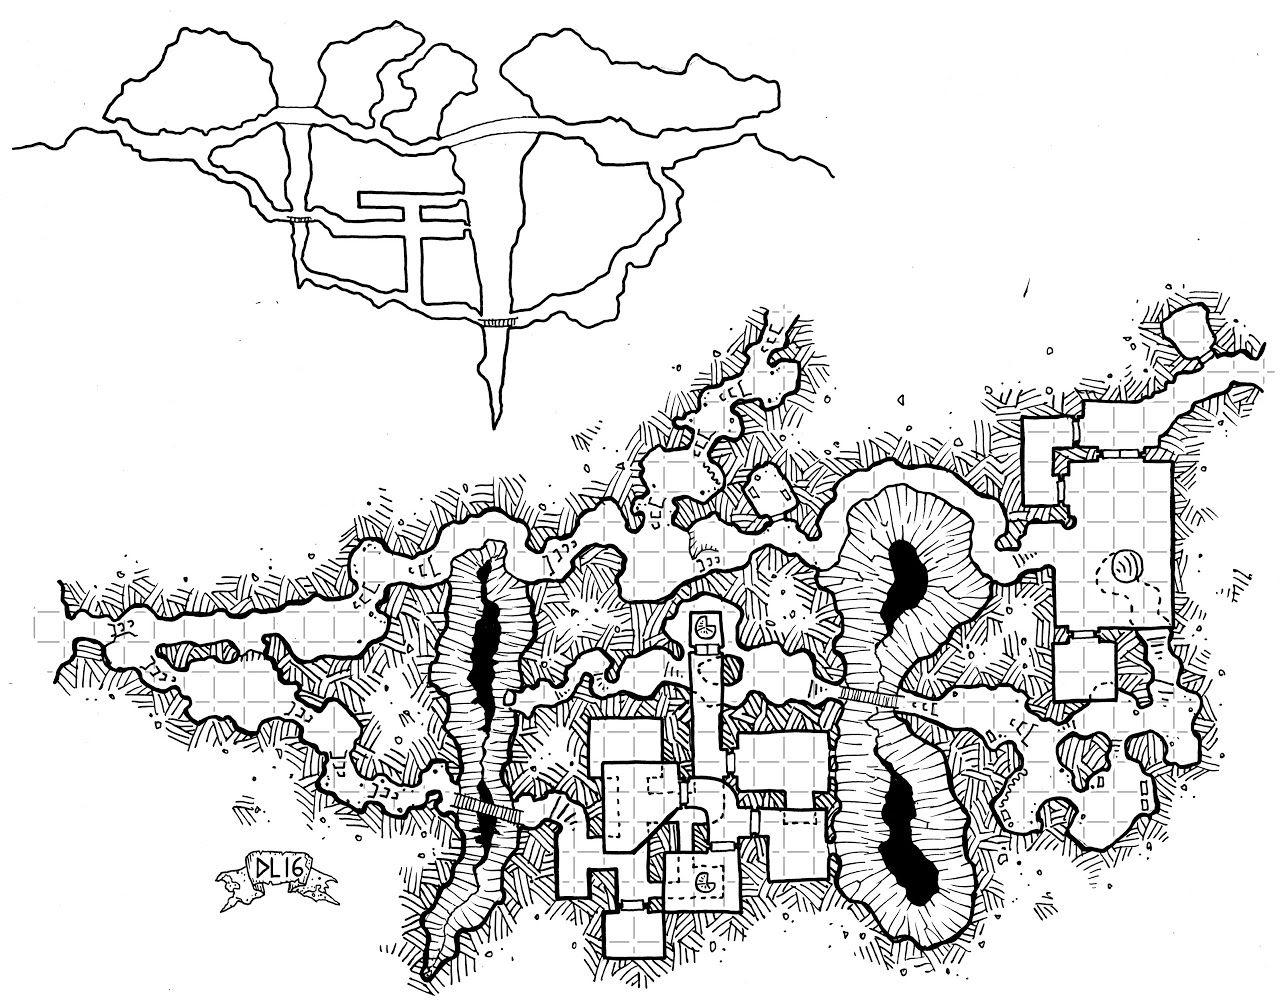 Pin By Mike Jordan On Gaming Maps